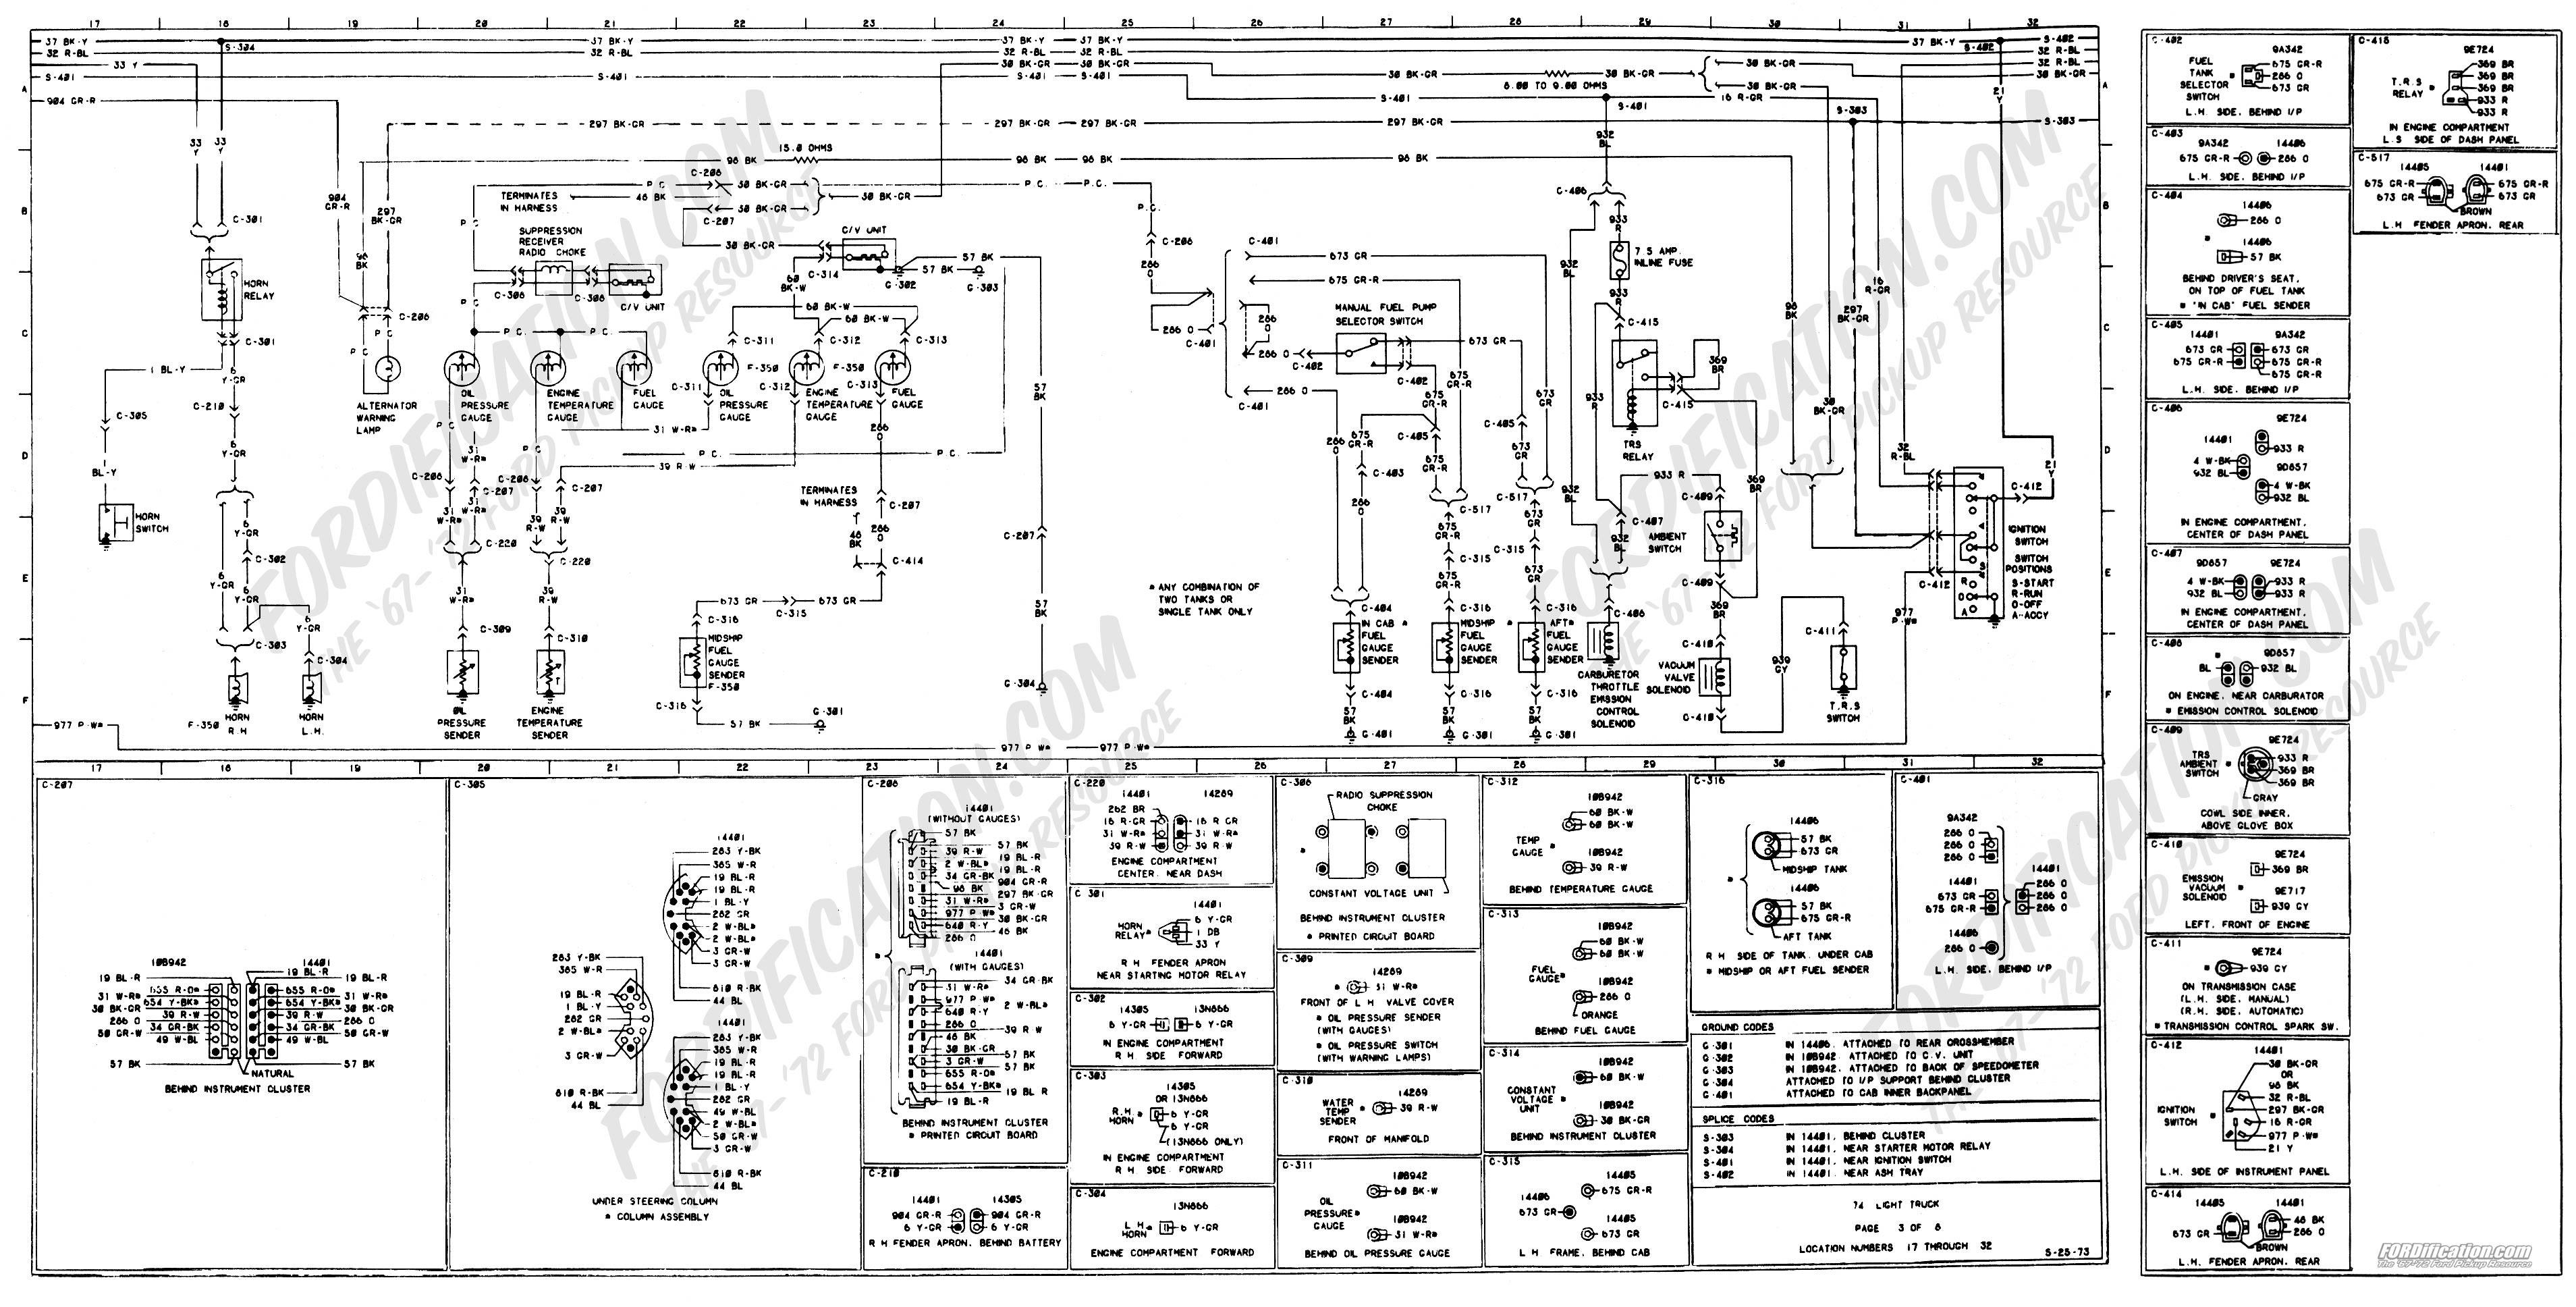 Transit Engine Diagram Wiring Schematic for A C Heat A 1984 F250 Diesel ford Truck